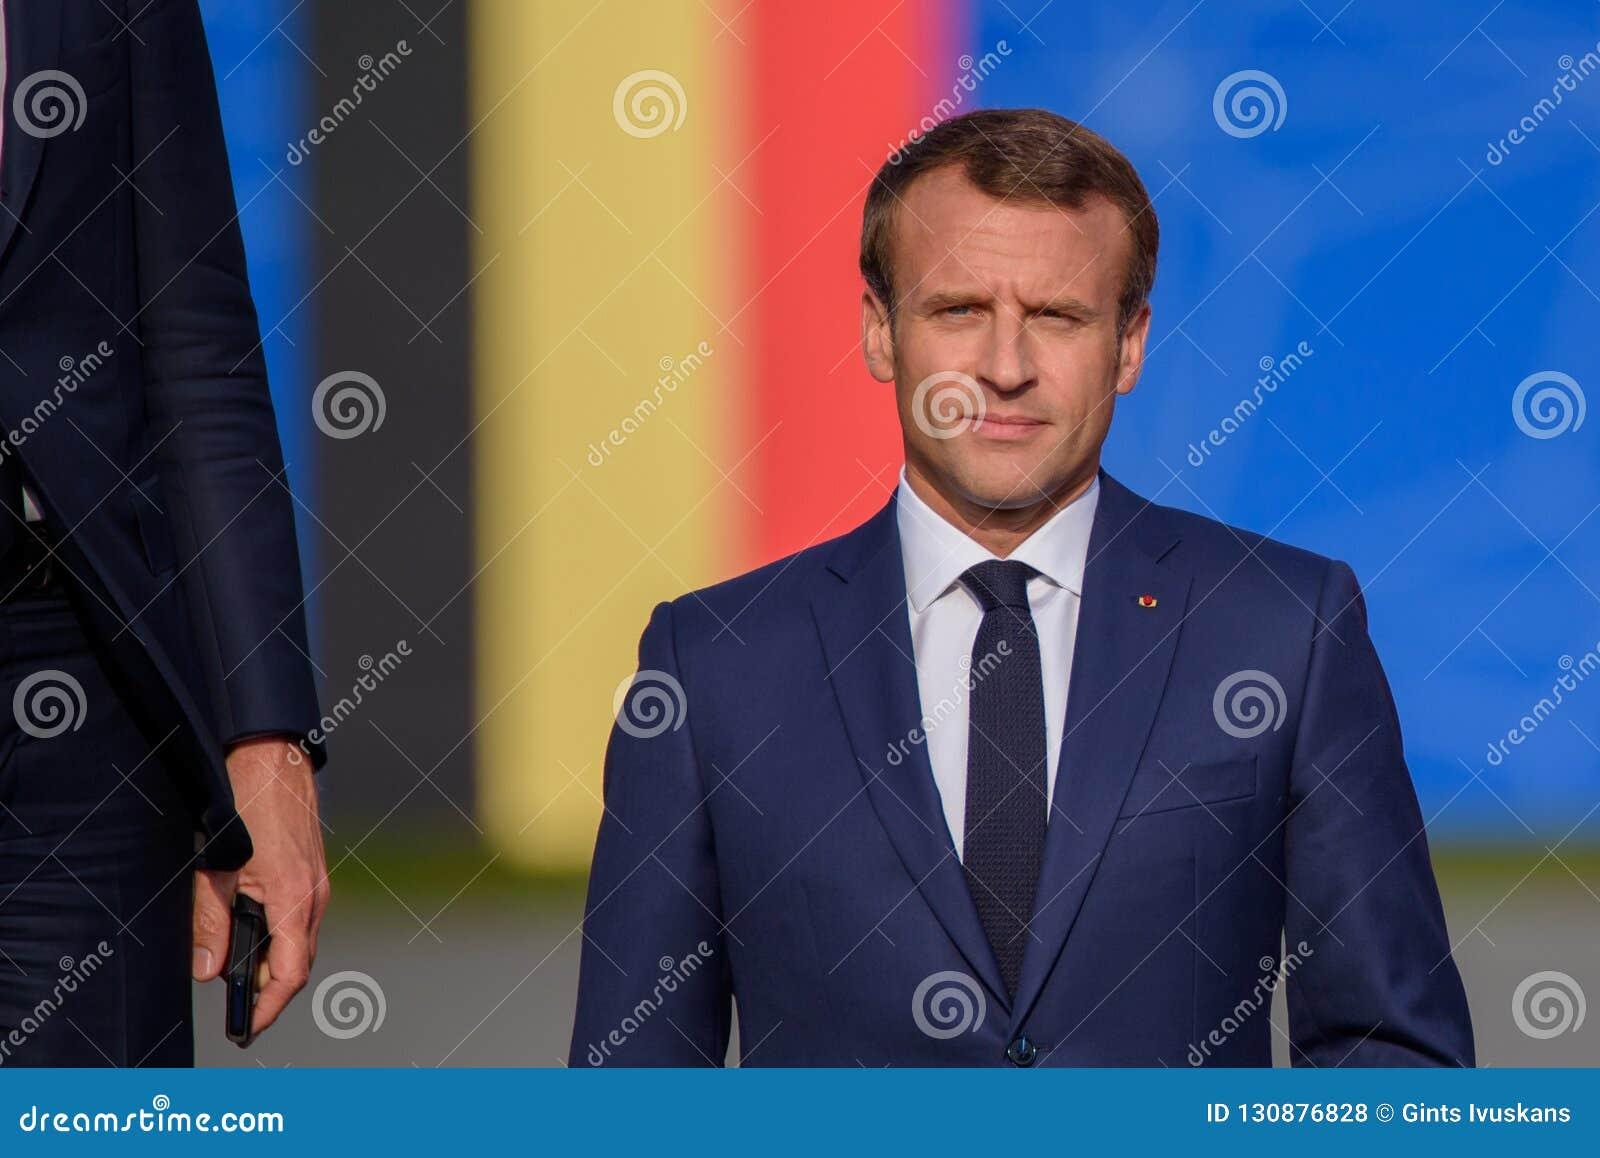 Emmanuel Macron Presidente De Franca Foto De Stock Editorial Imagem De Presidente Macron 130876828